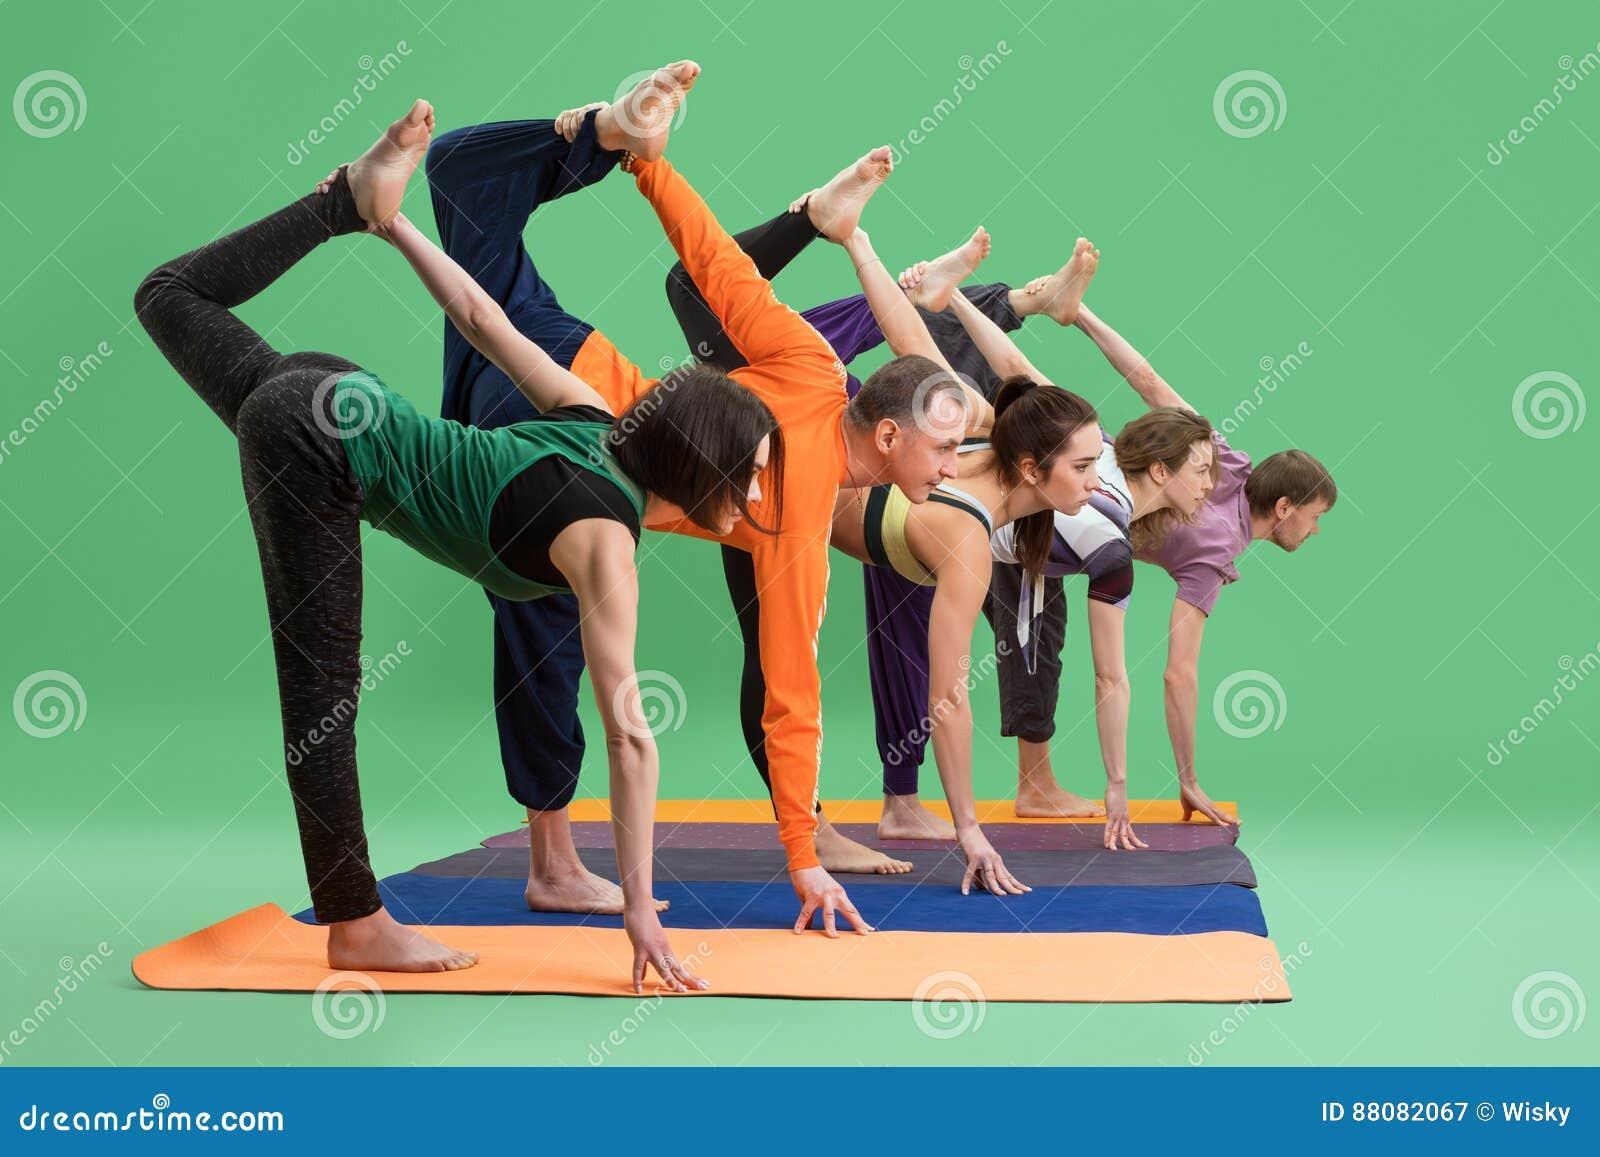 Men and women do yoga in studio green background